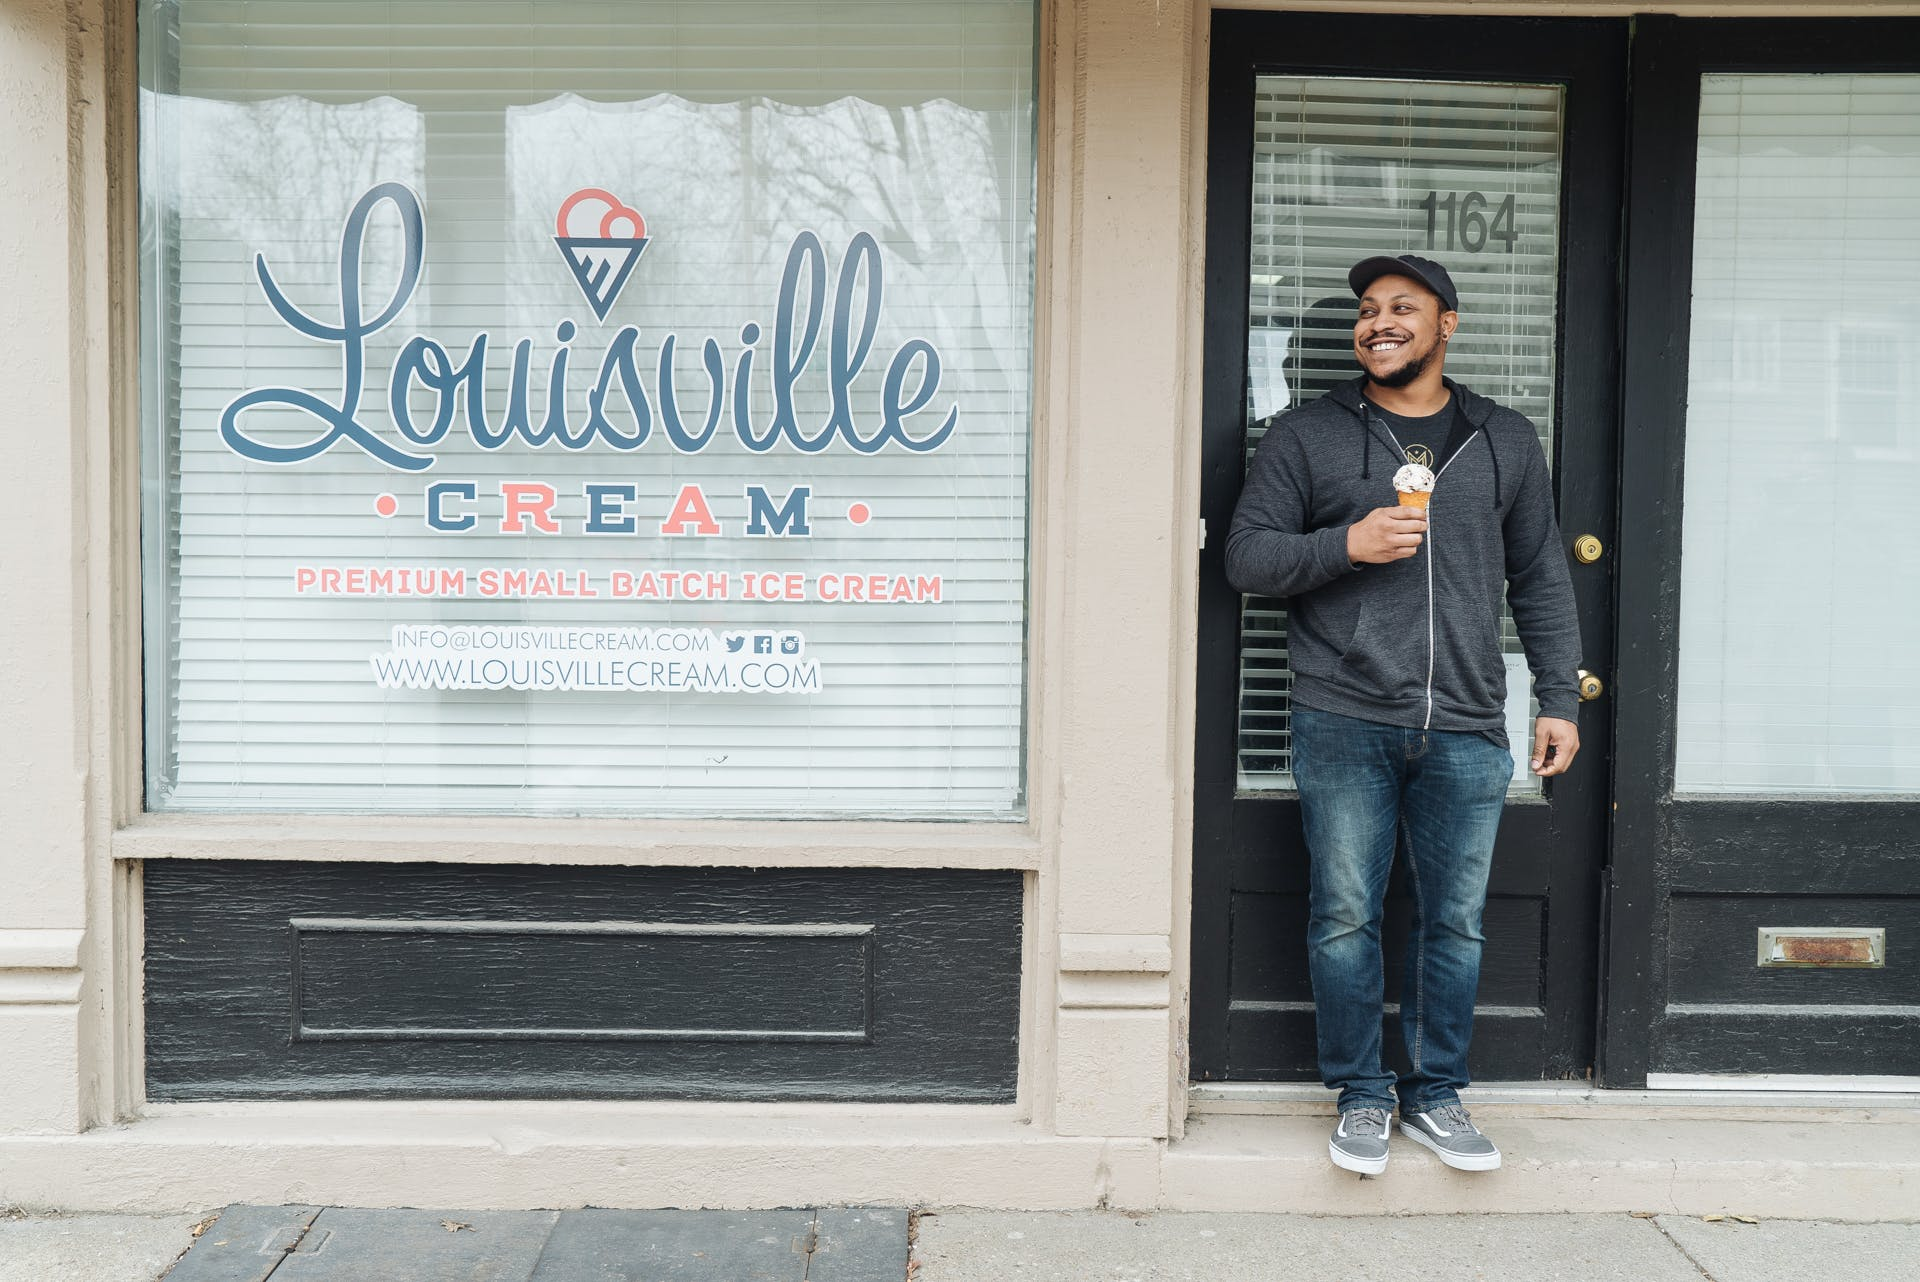 Louisville Cream